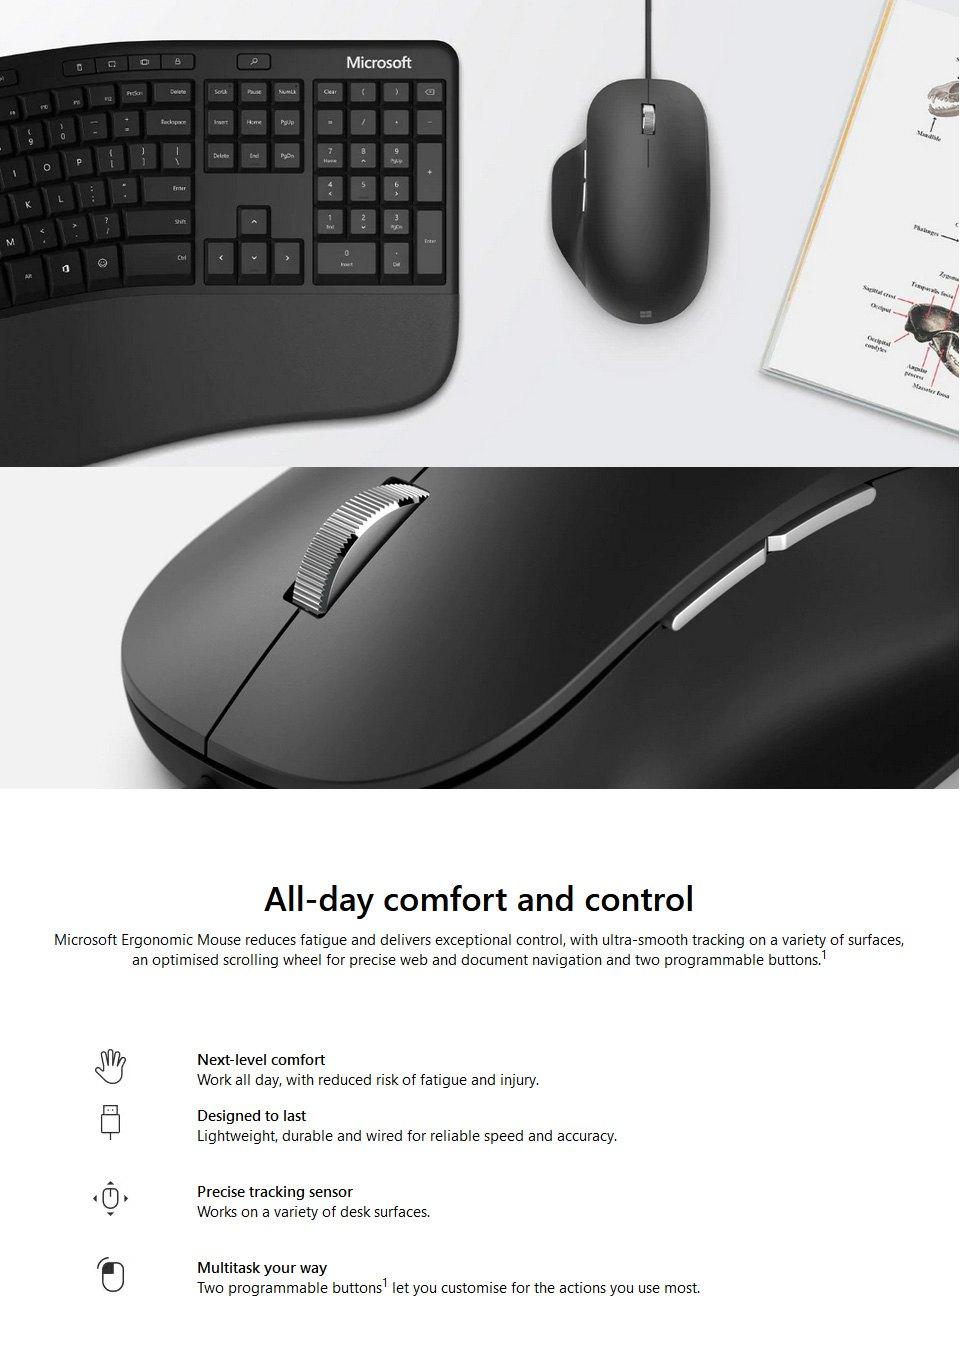 Microsoft Ergonomic USB Mouse features